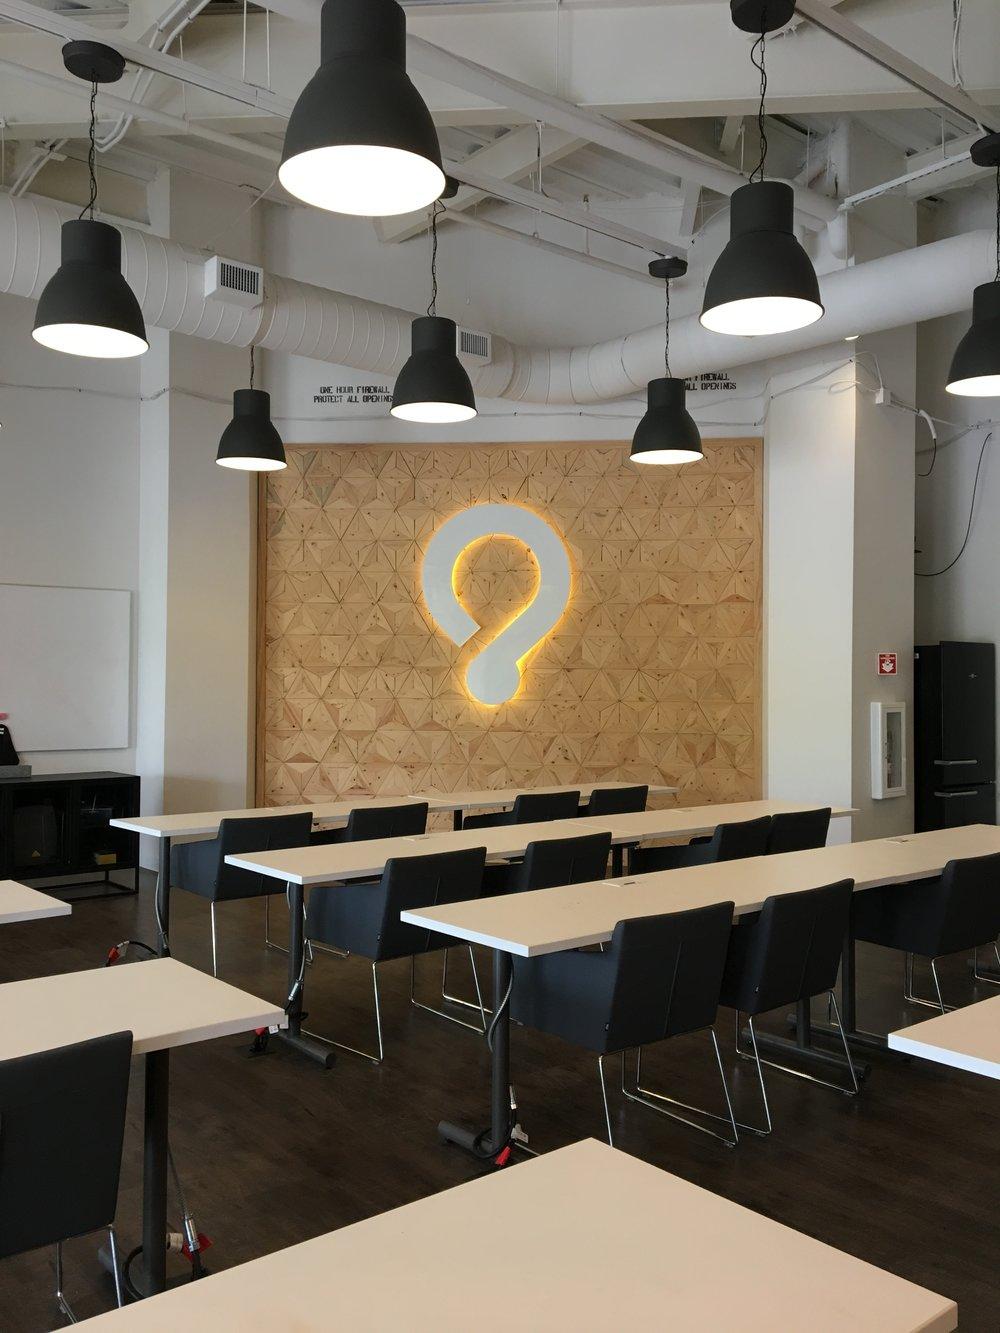 classroom design custom sign.JPG